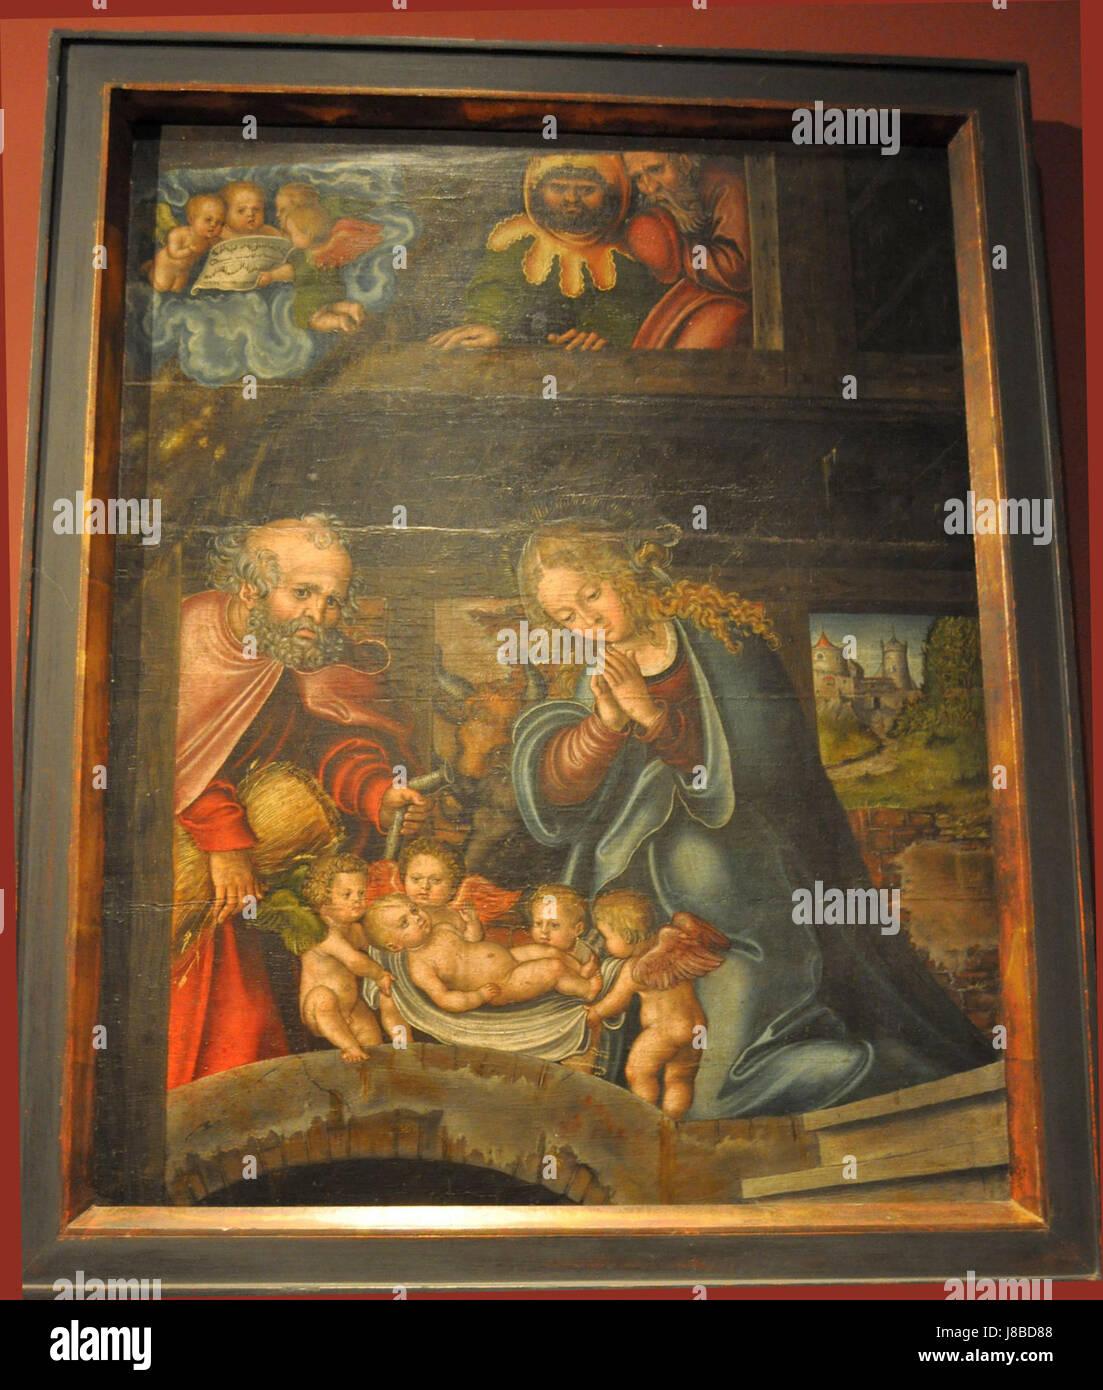 Lucas Cranach Geburt Christi 02 - Stock Image